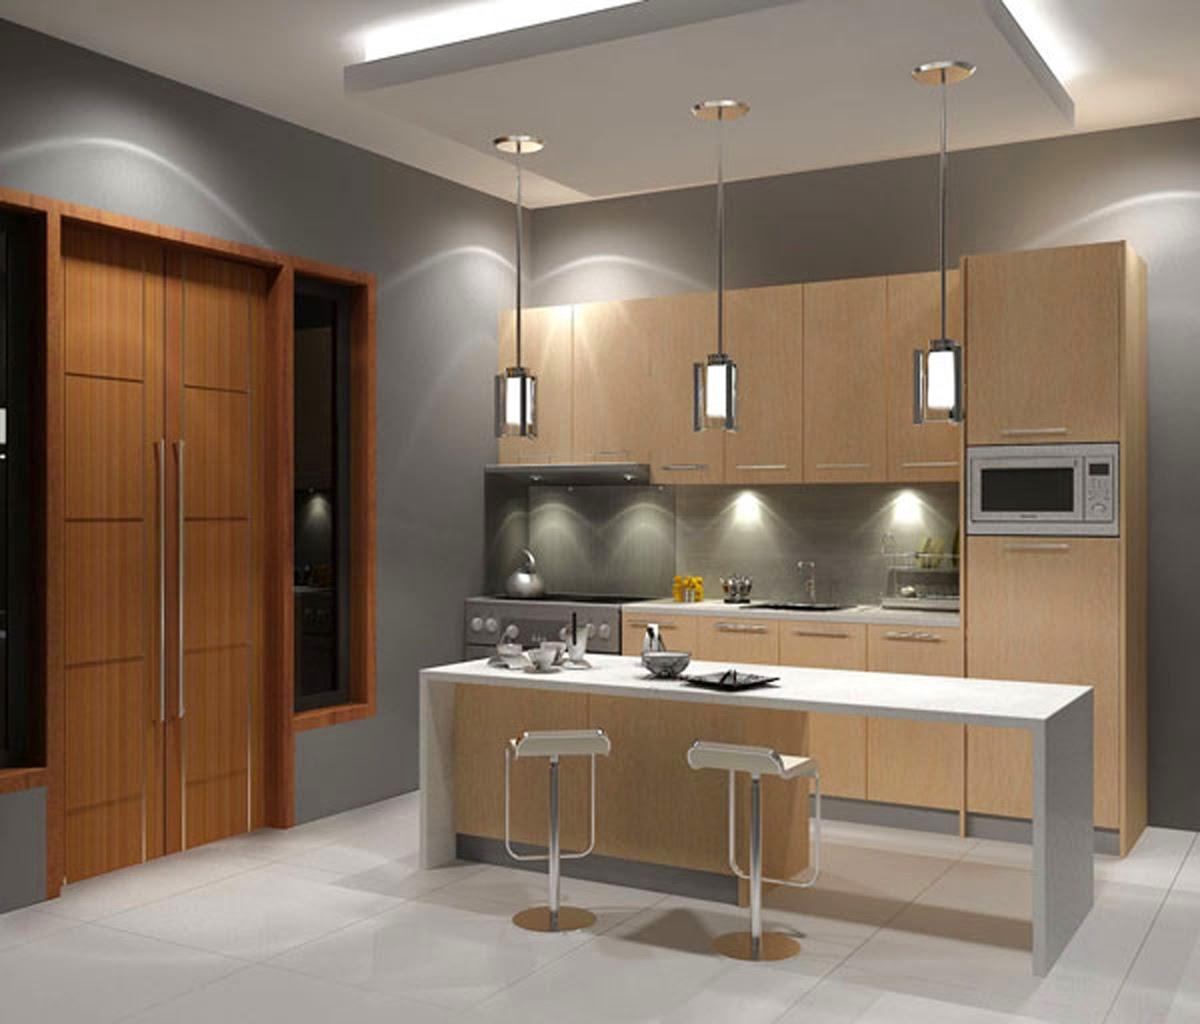 Contoh Desain Kitchen Set Dapur Sederhana